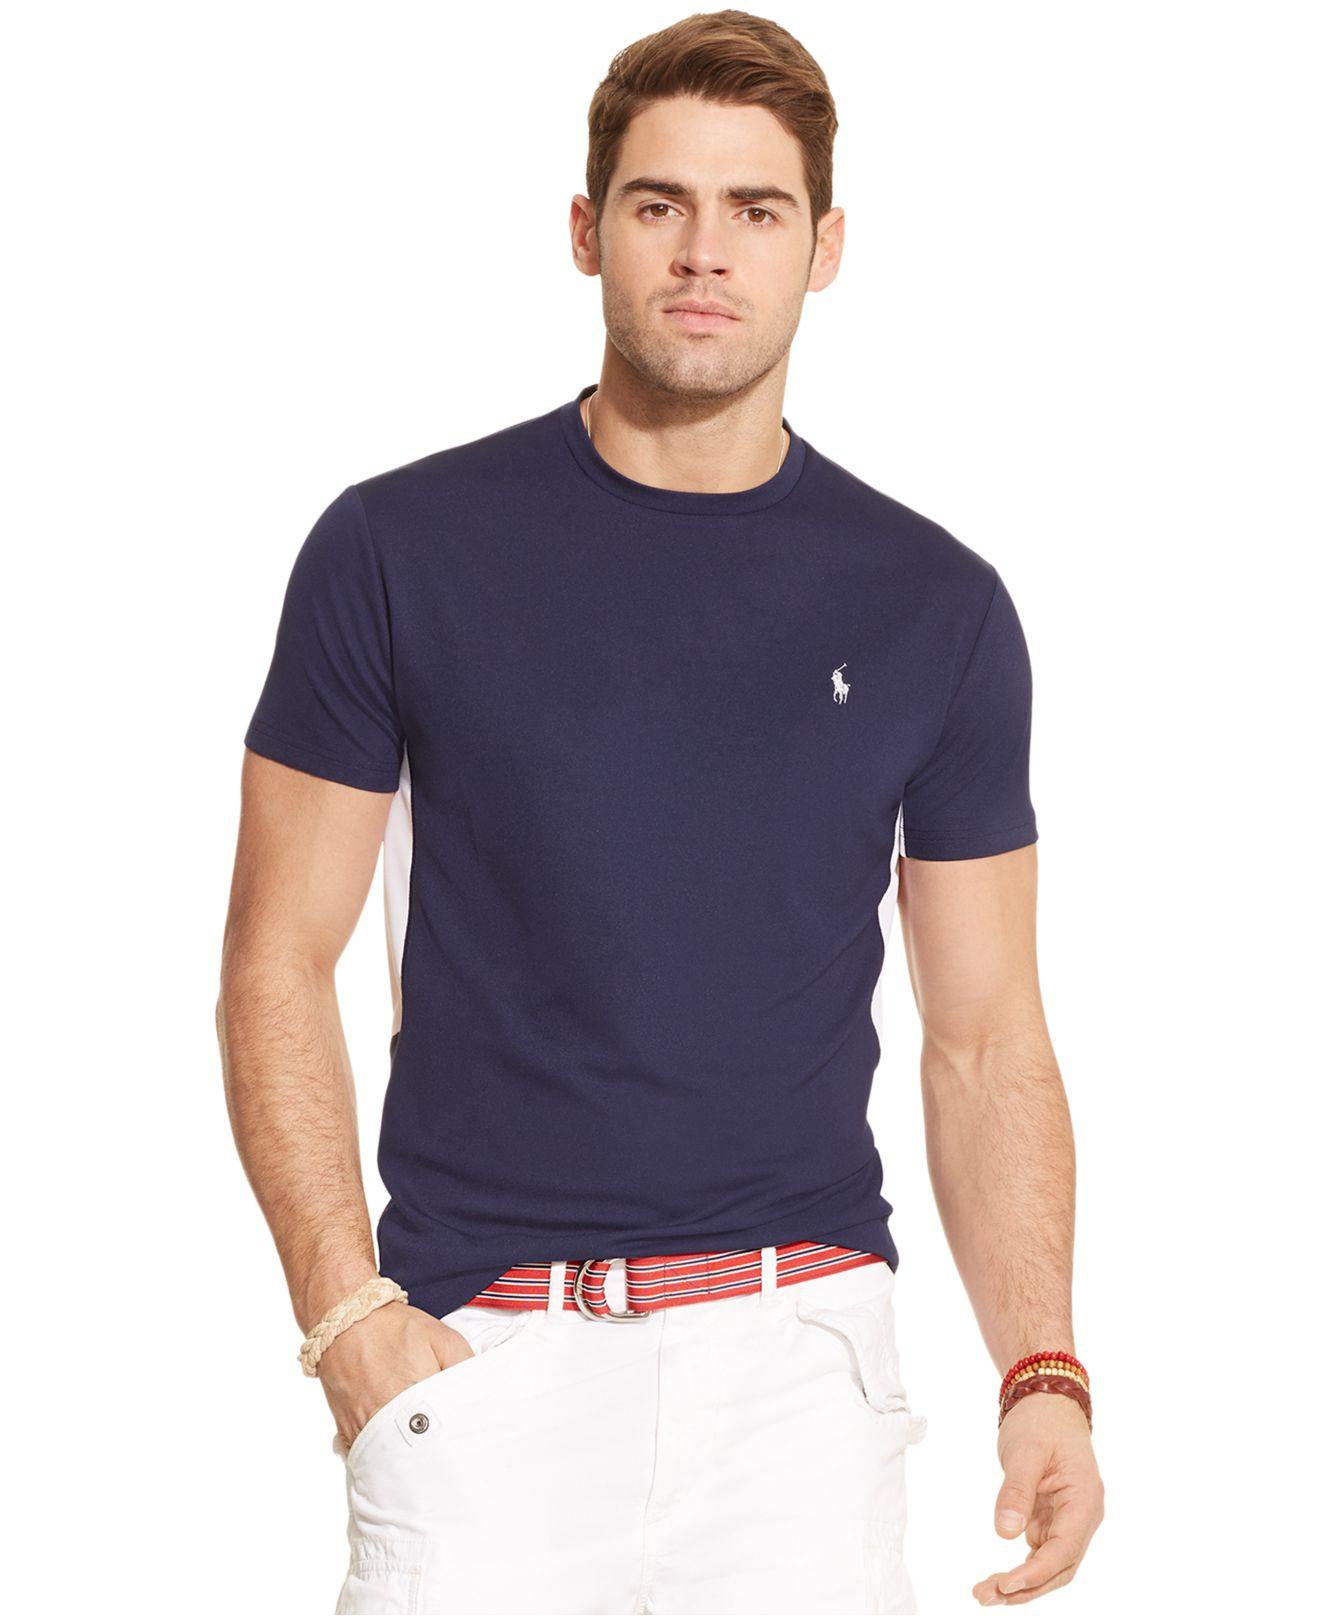 Polo ralph lauren performance jersey crewneck t shirt in for Ralph lauren polo jersey shirt